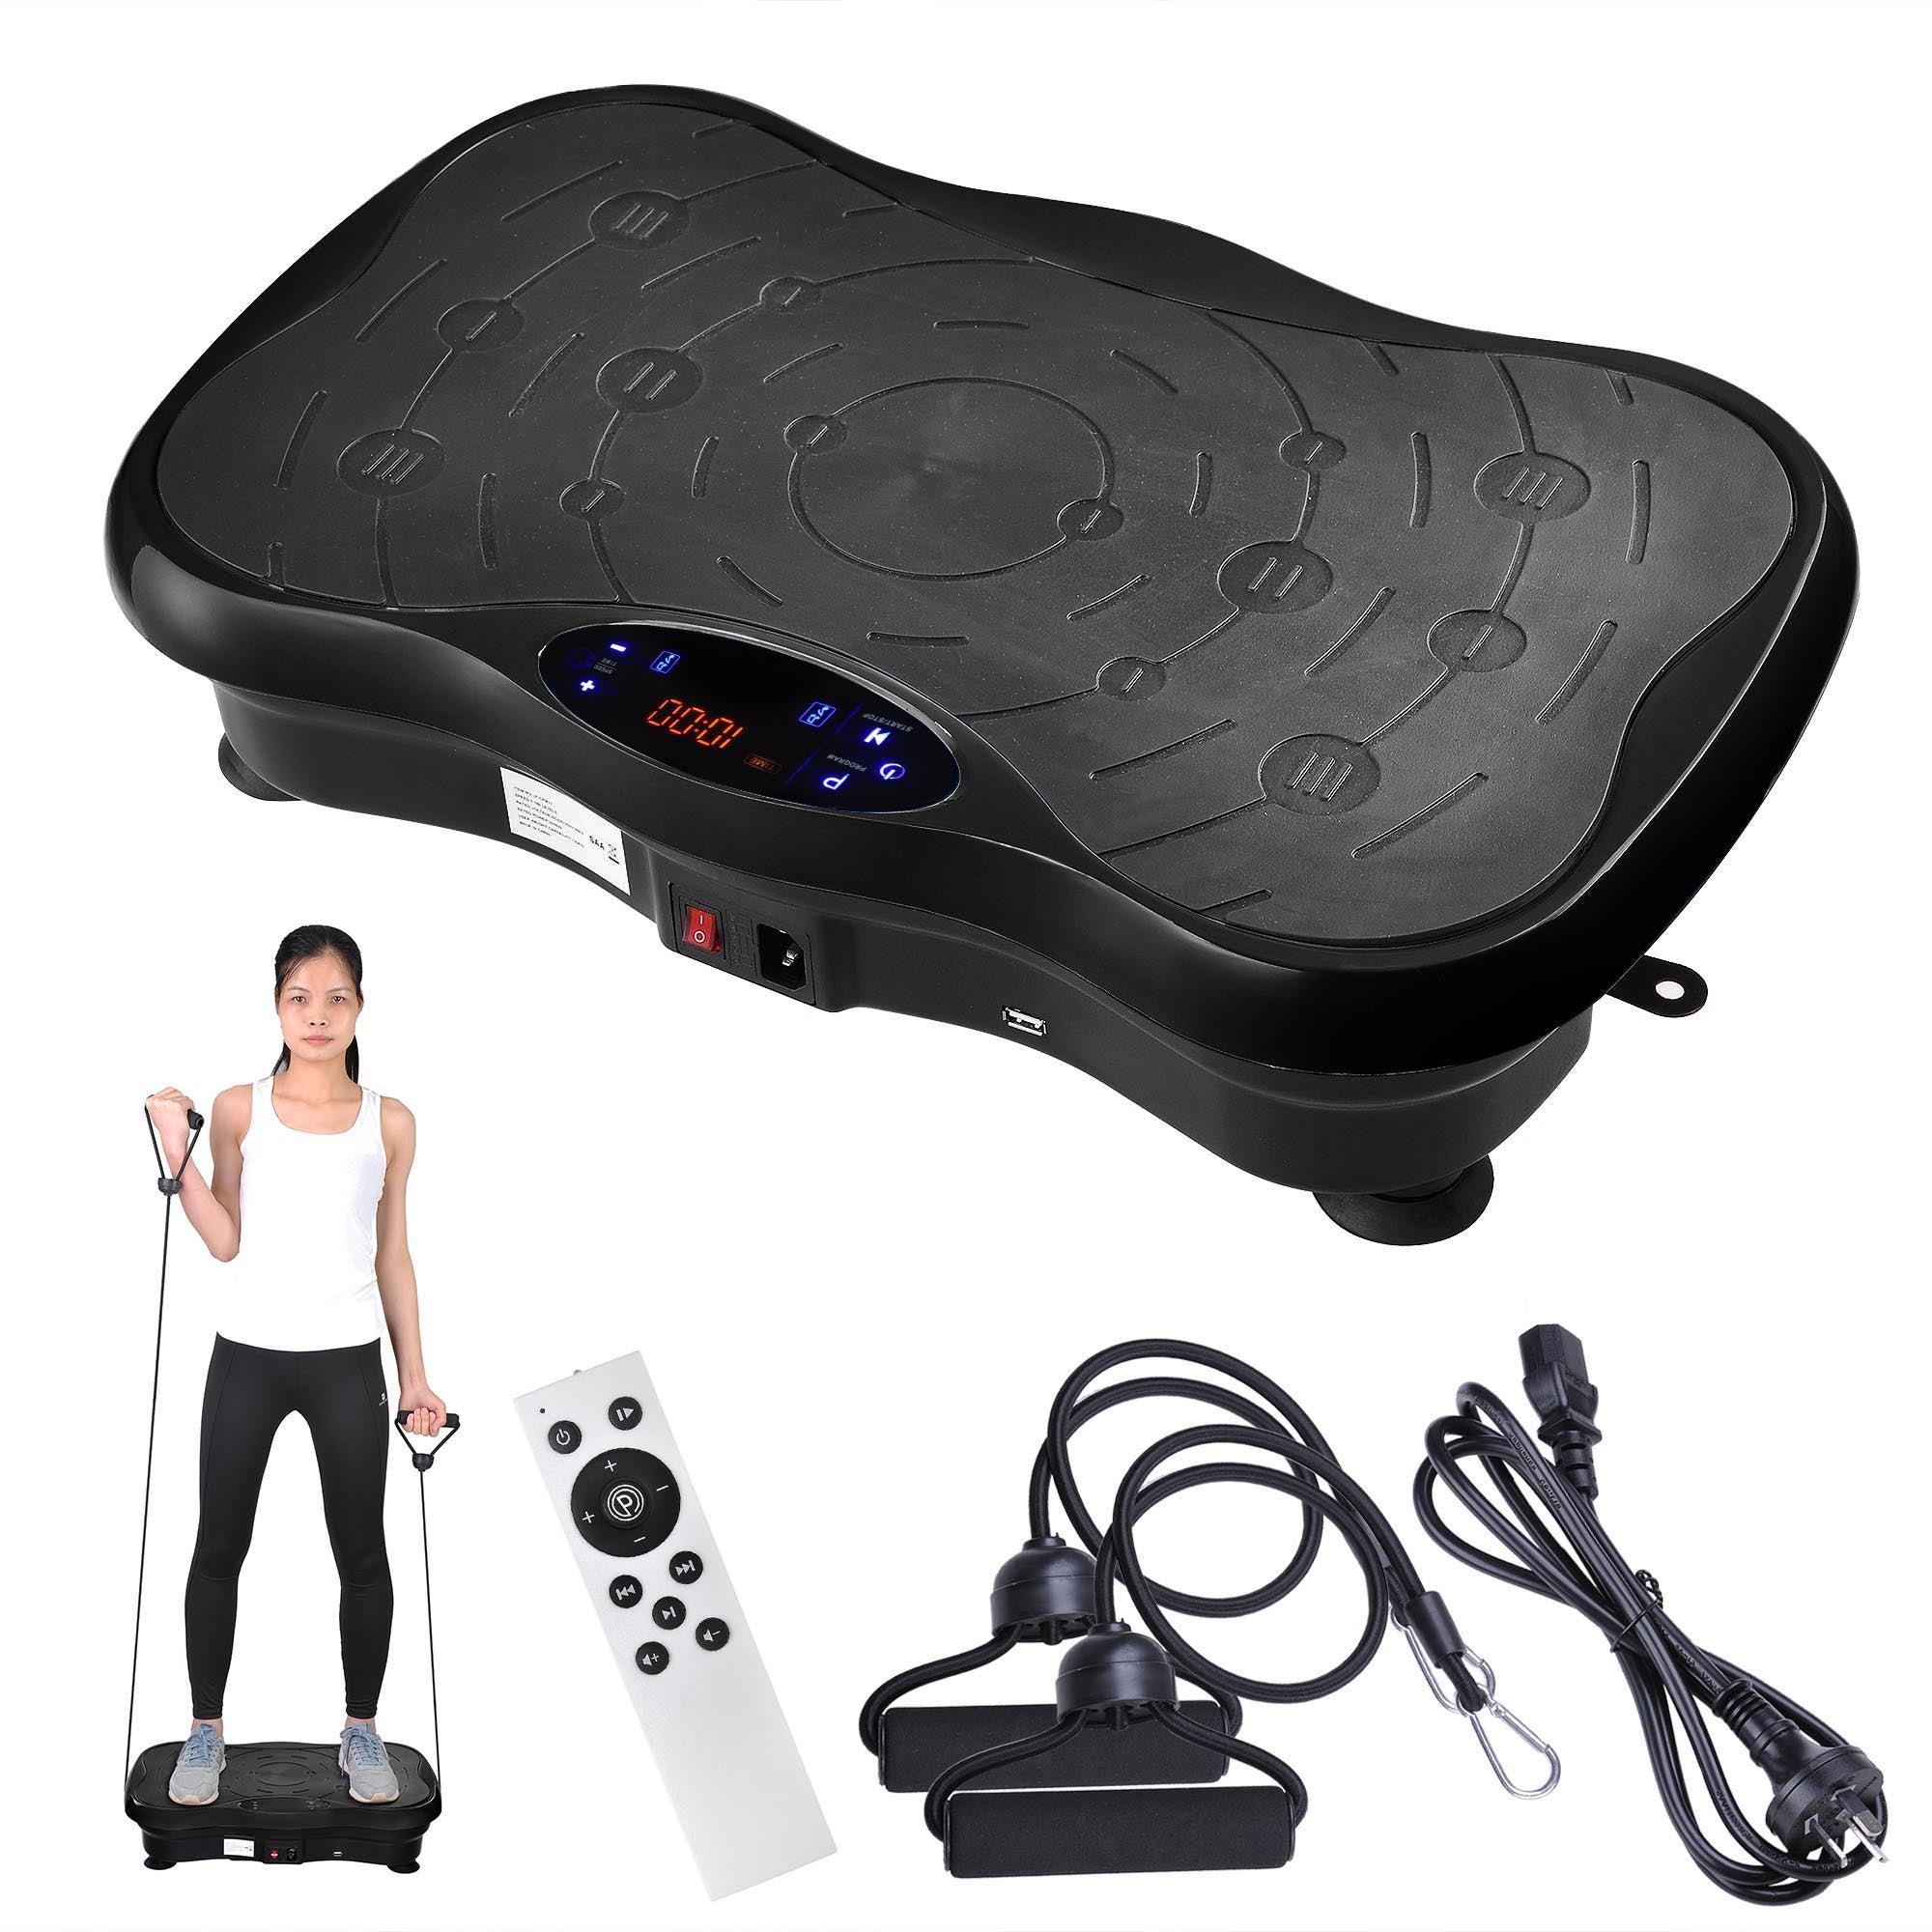 Yescom 3500W Slim Vibration Machine Platform Bluetooth Body Shaper Exercise Black